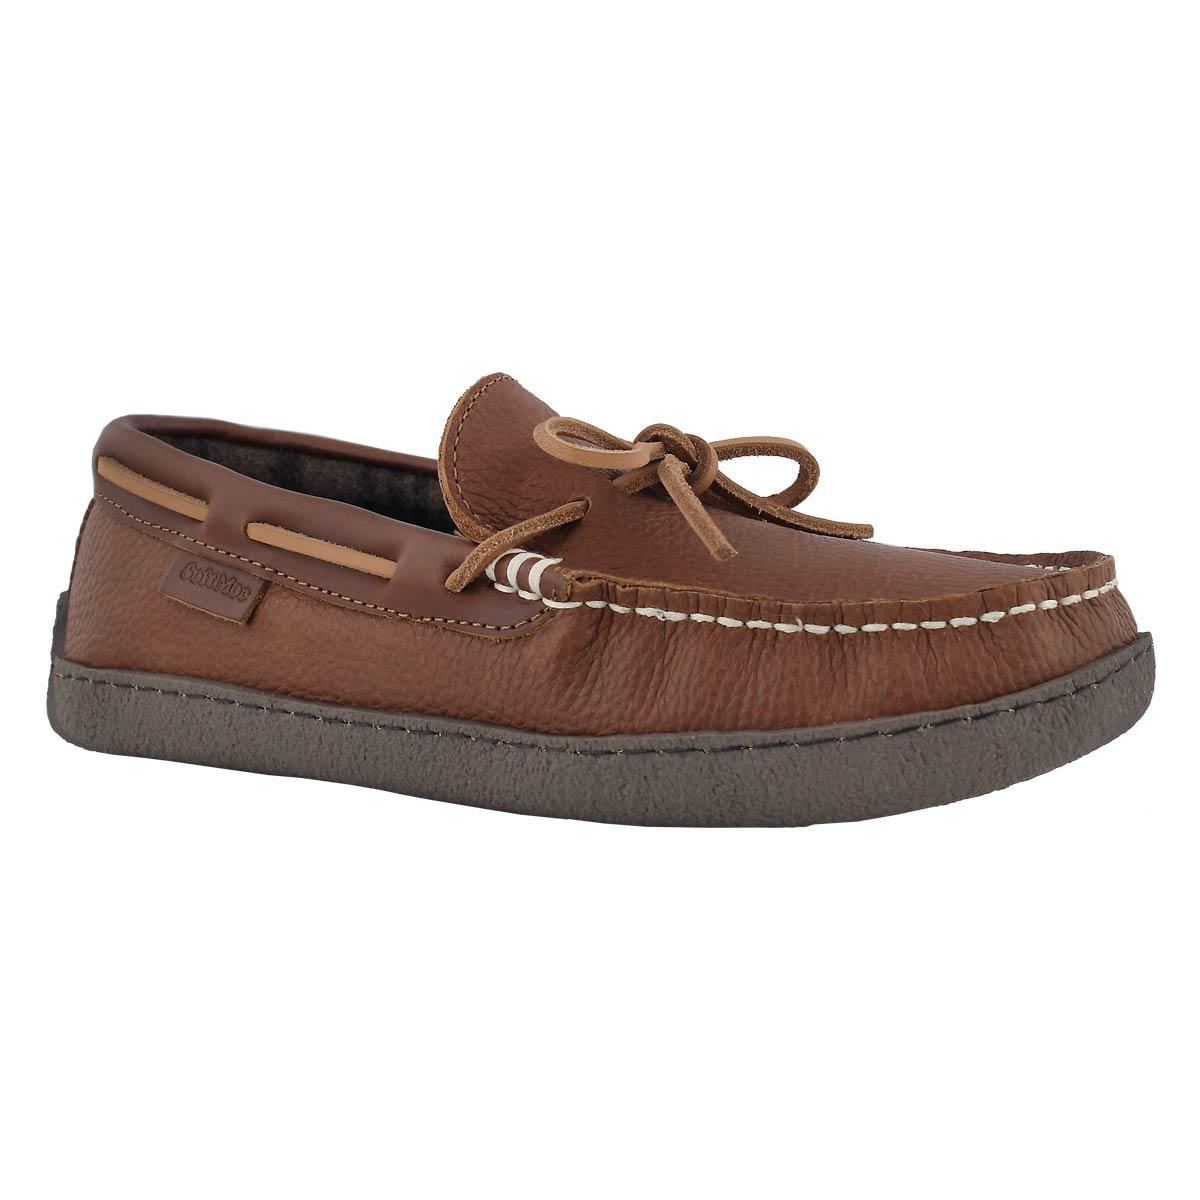 Mns Kingston brown plaid lined moc